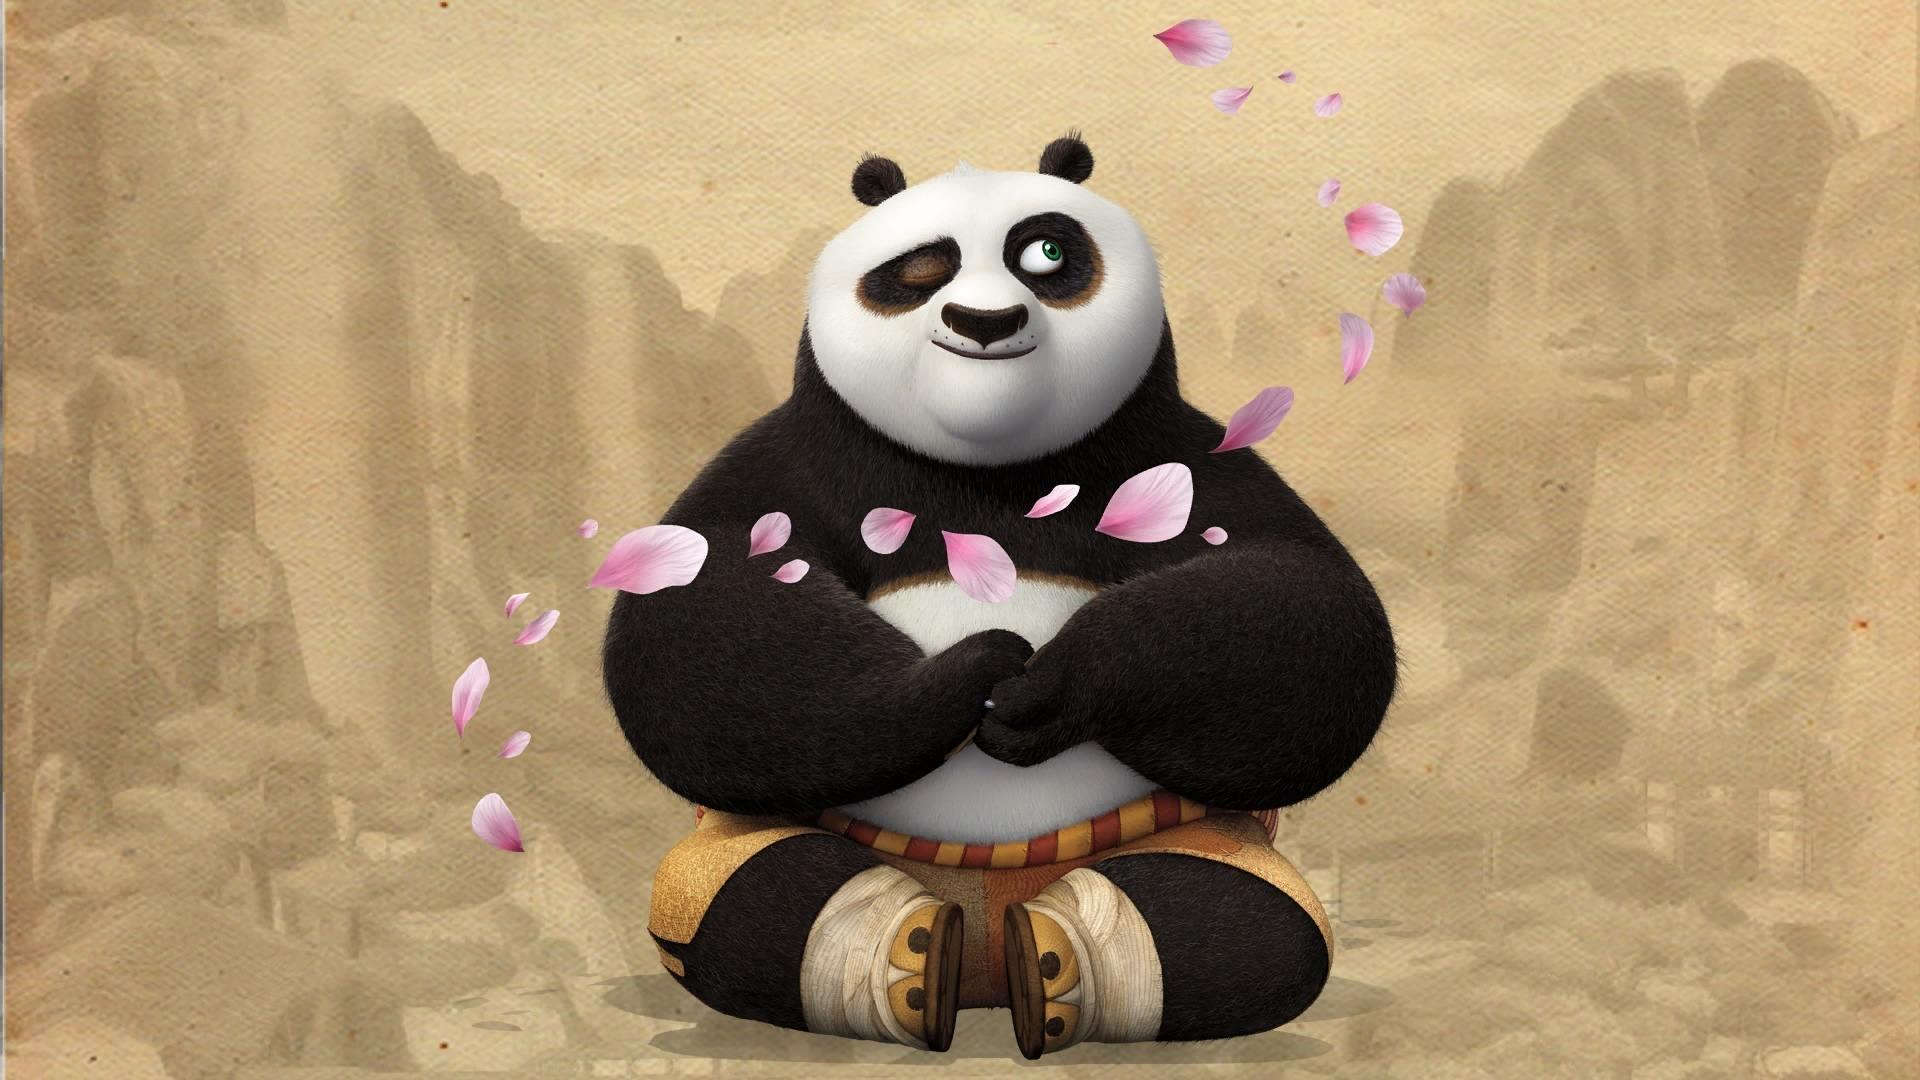 система наготове, картинки поз кунг фу панда символом часто